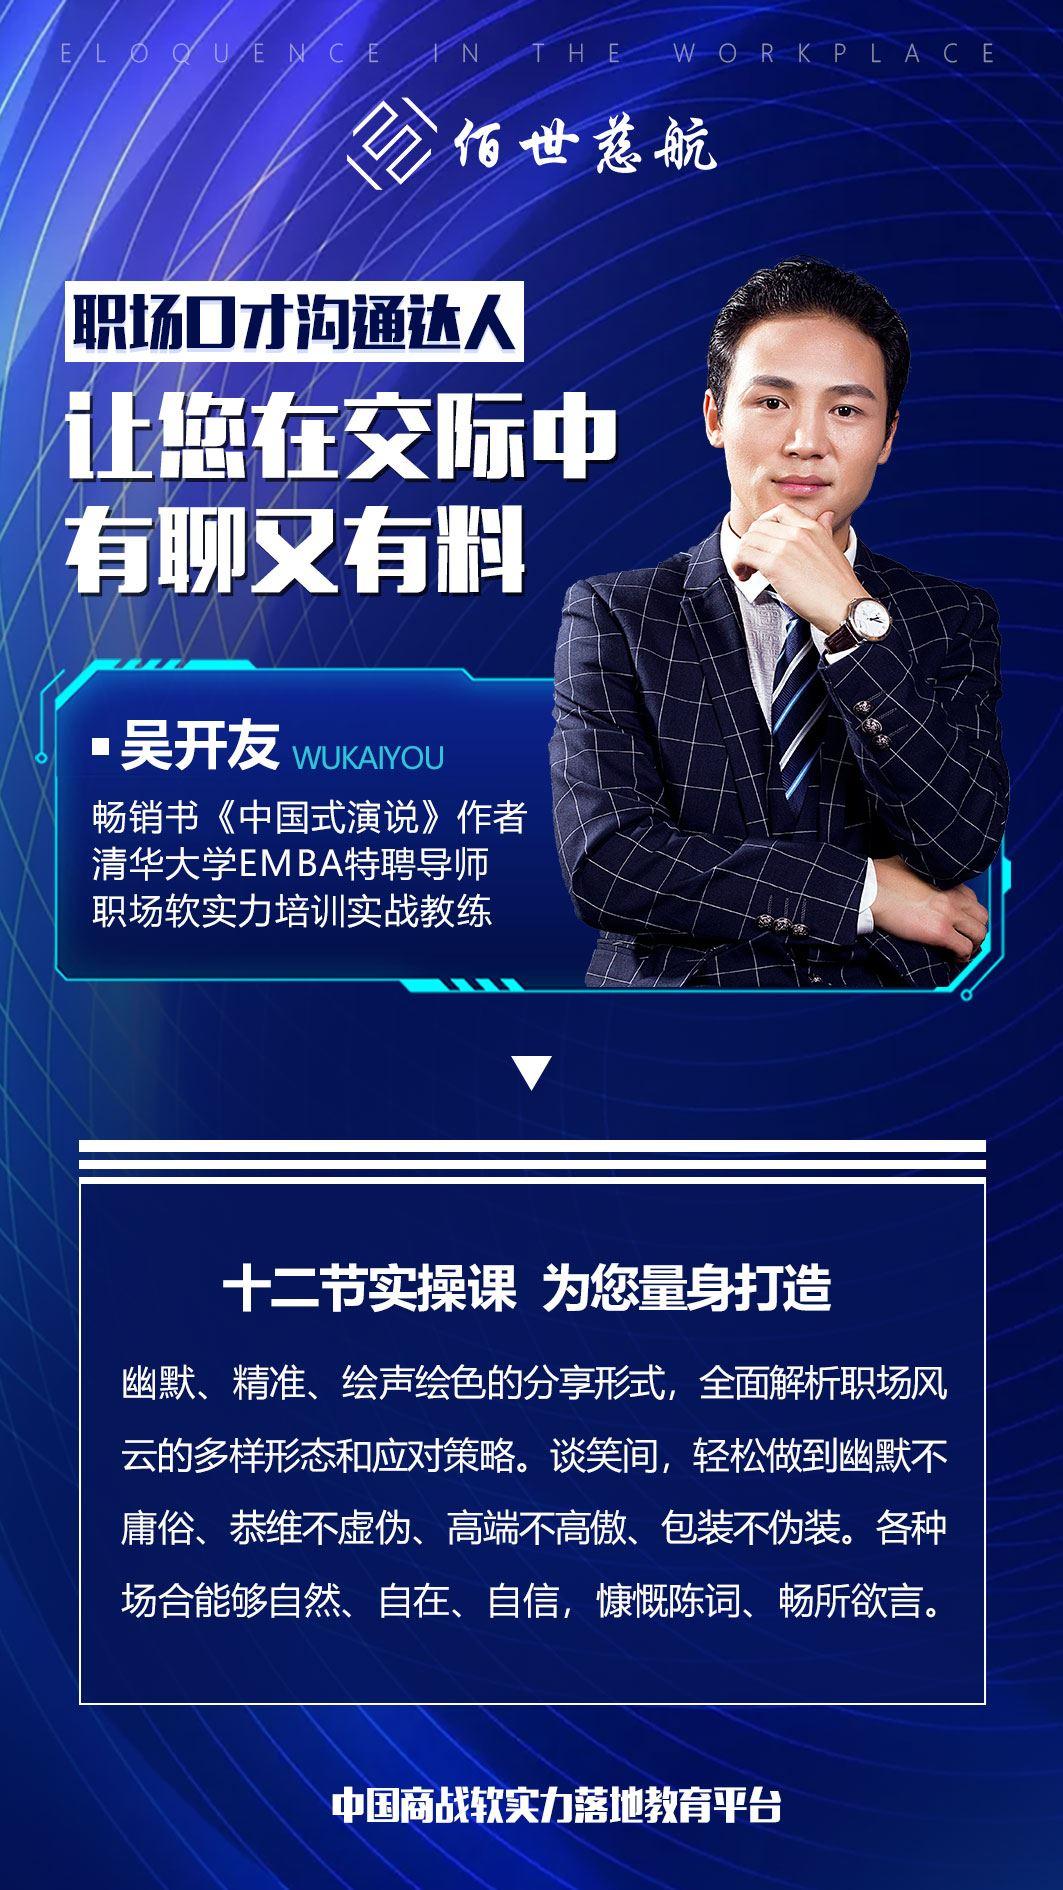 http://www.huodongxing.com/file/20160330/2512280531473/314134535840751.jpg